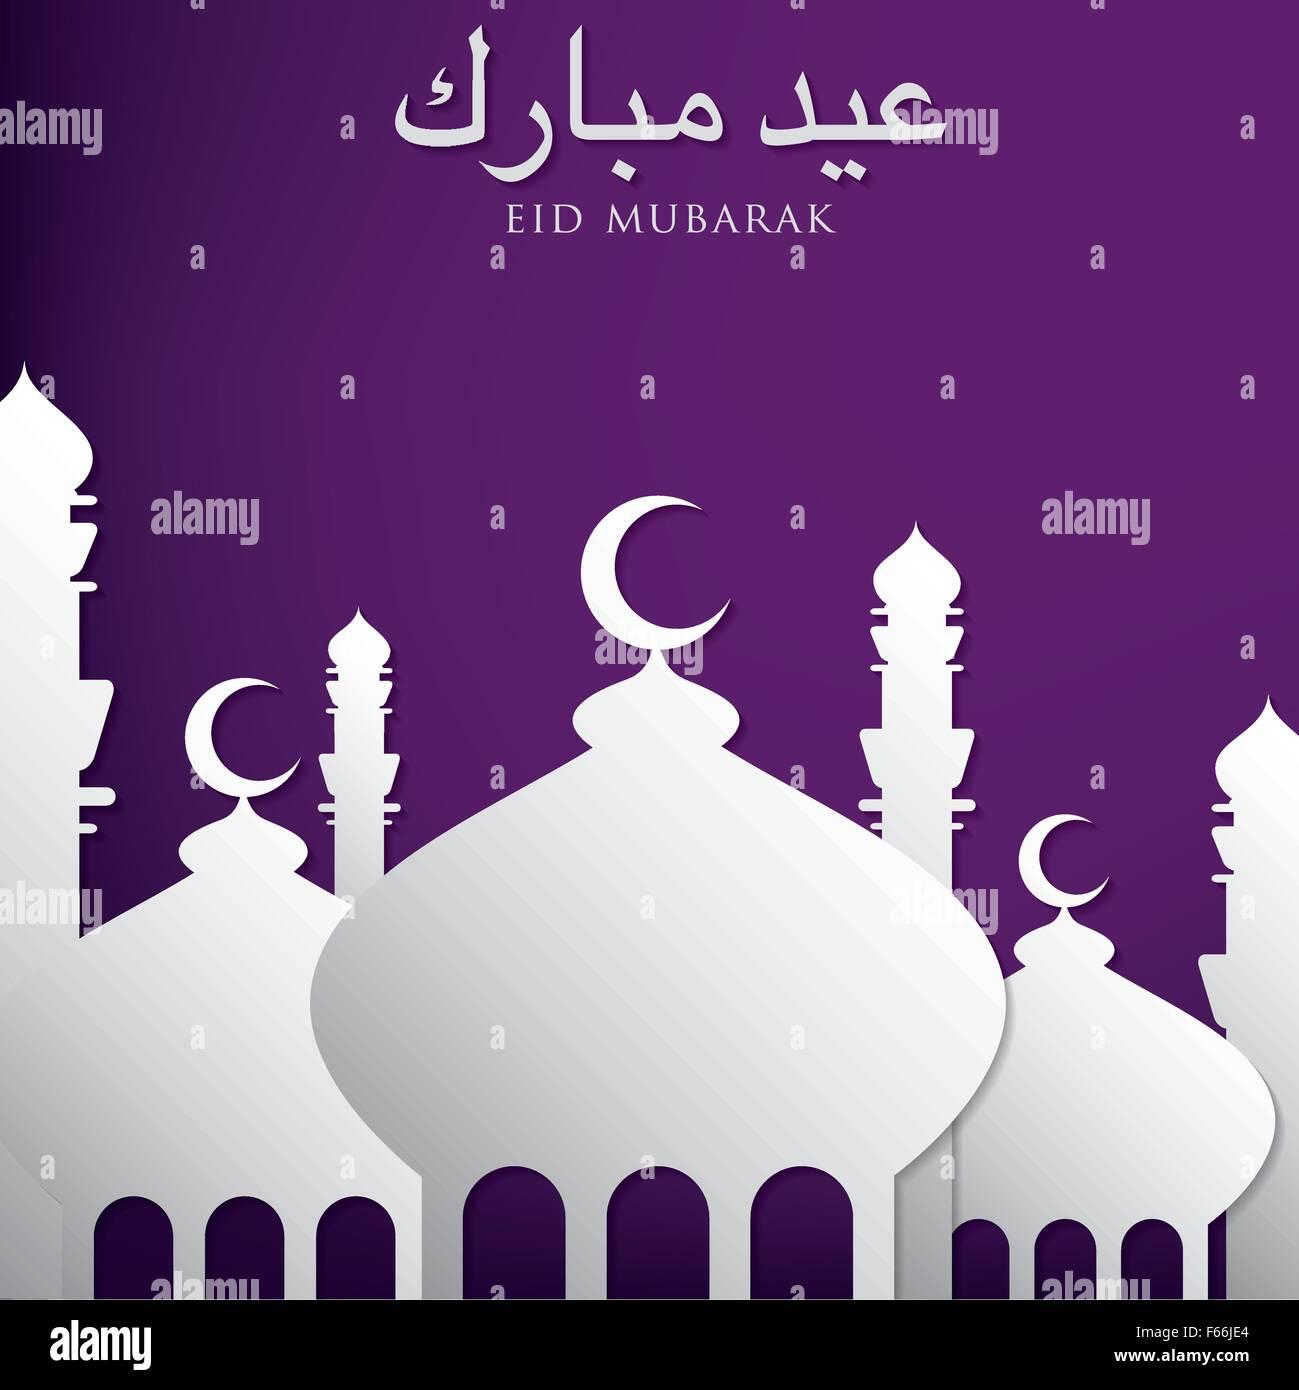 Mosque eid mubarak blessed eid card in vector format stock mosque eid mubarak blessed eid card in vector format kristyandbryce Image collections